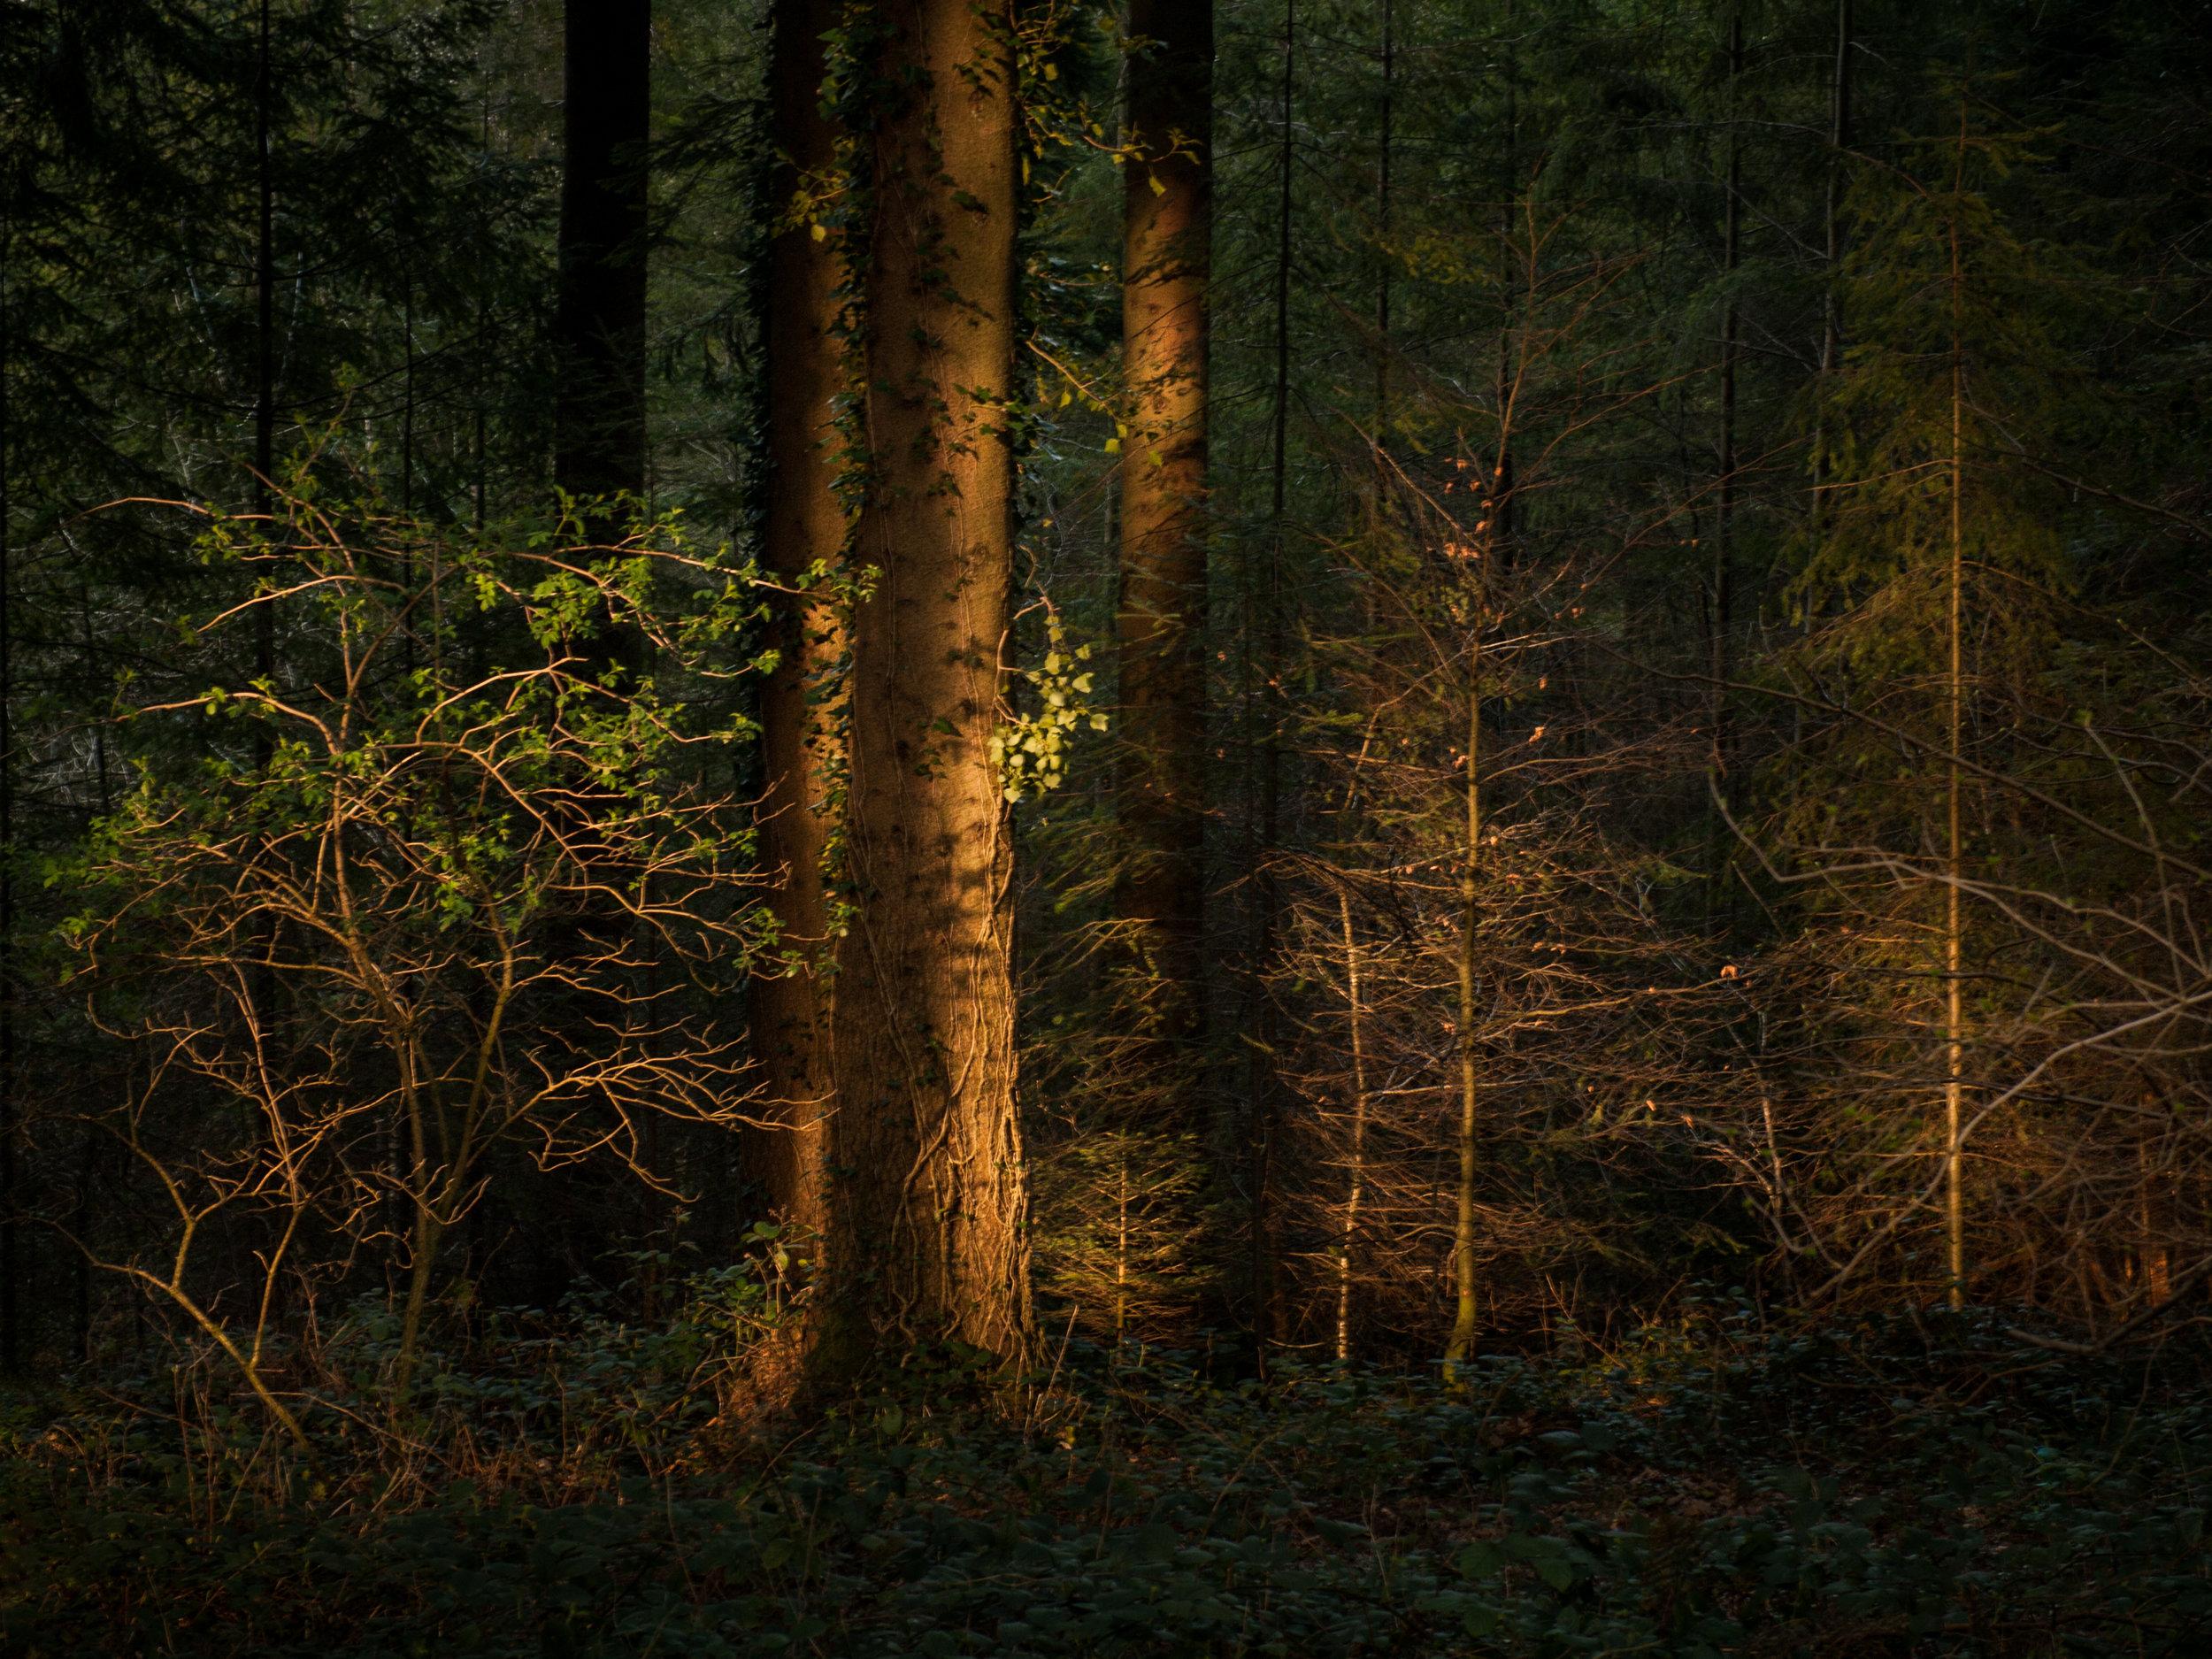 Leica Digilux 3, Leica 14mm to 50mm lens. Fedw wood, Chepstow.